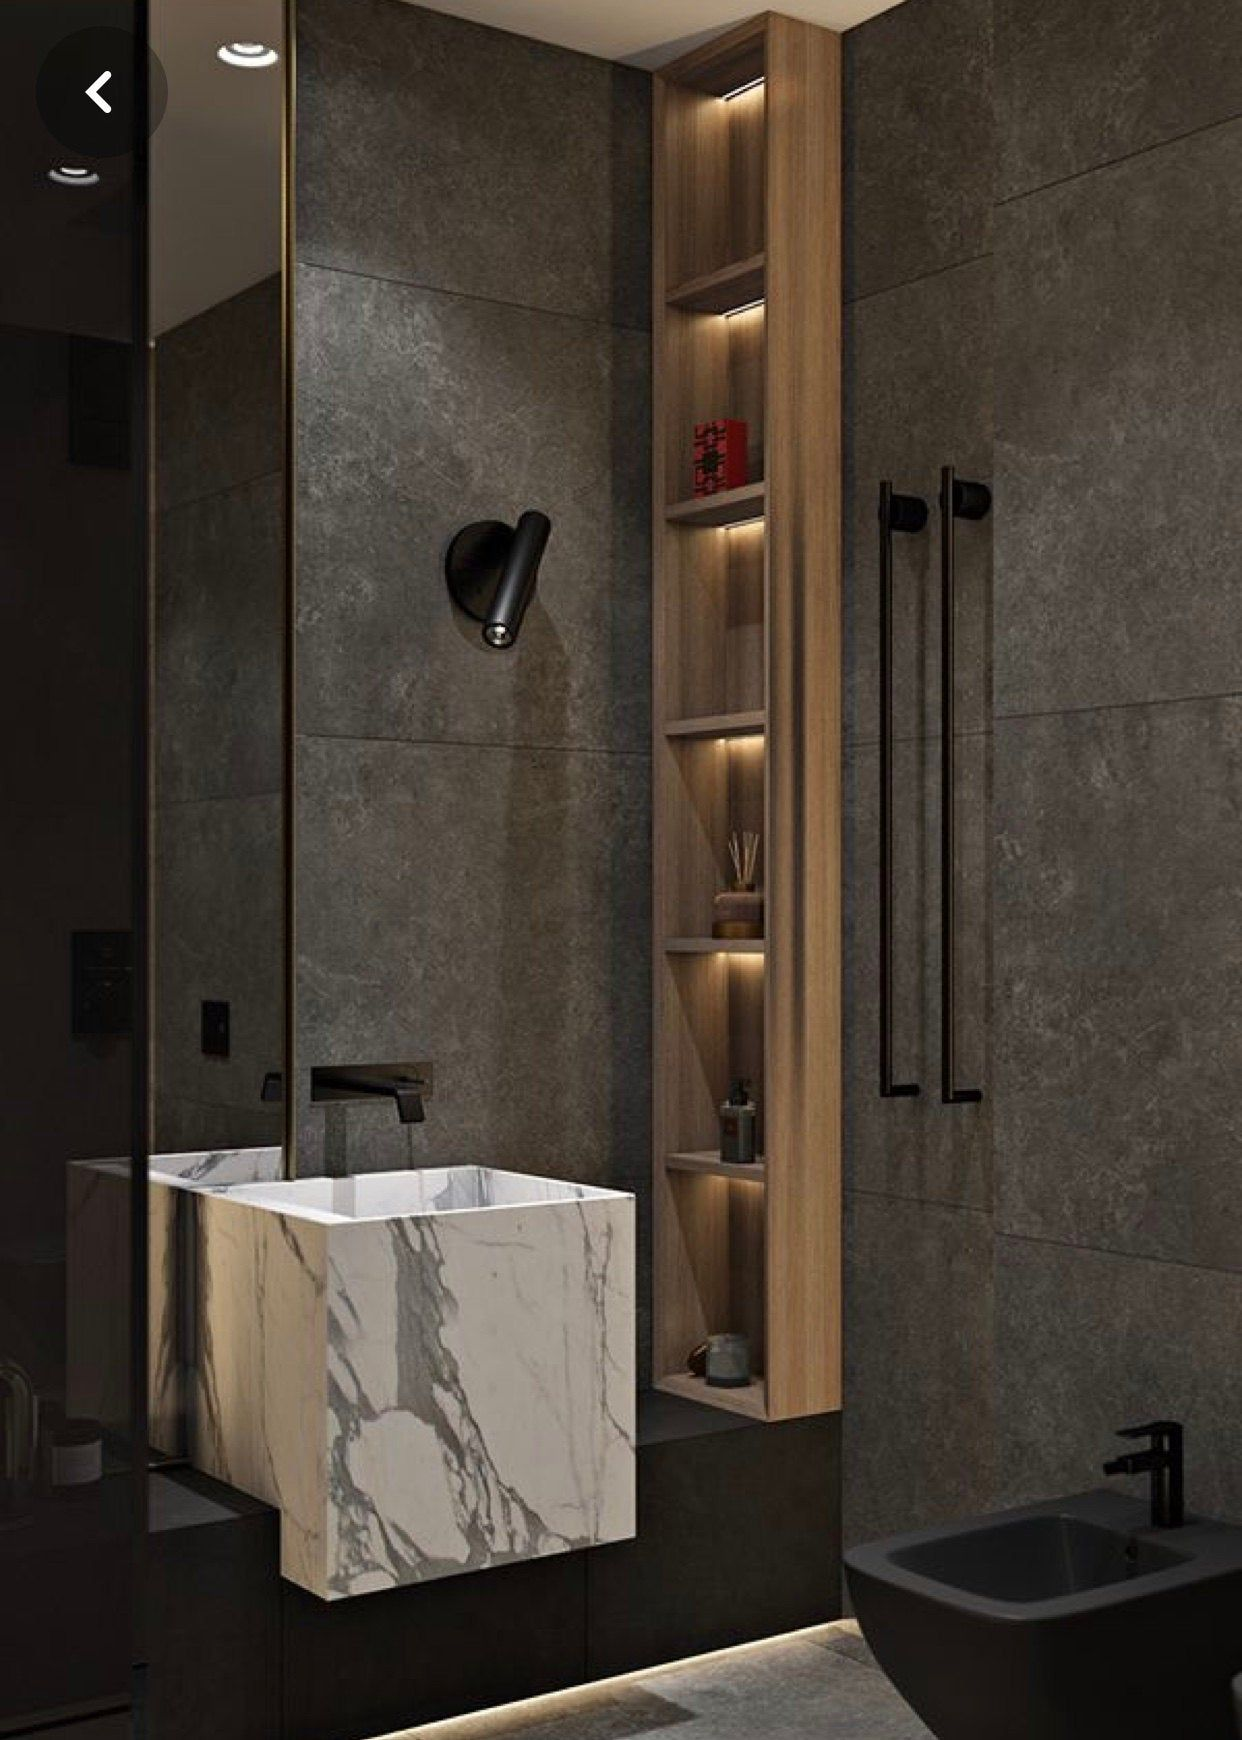 Round Marble Sink Washbasin Italian Arabescato 100 Made In Italy In 2021 Washroom Design Bathroom Design Decor Bathroom Interior Design